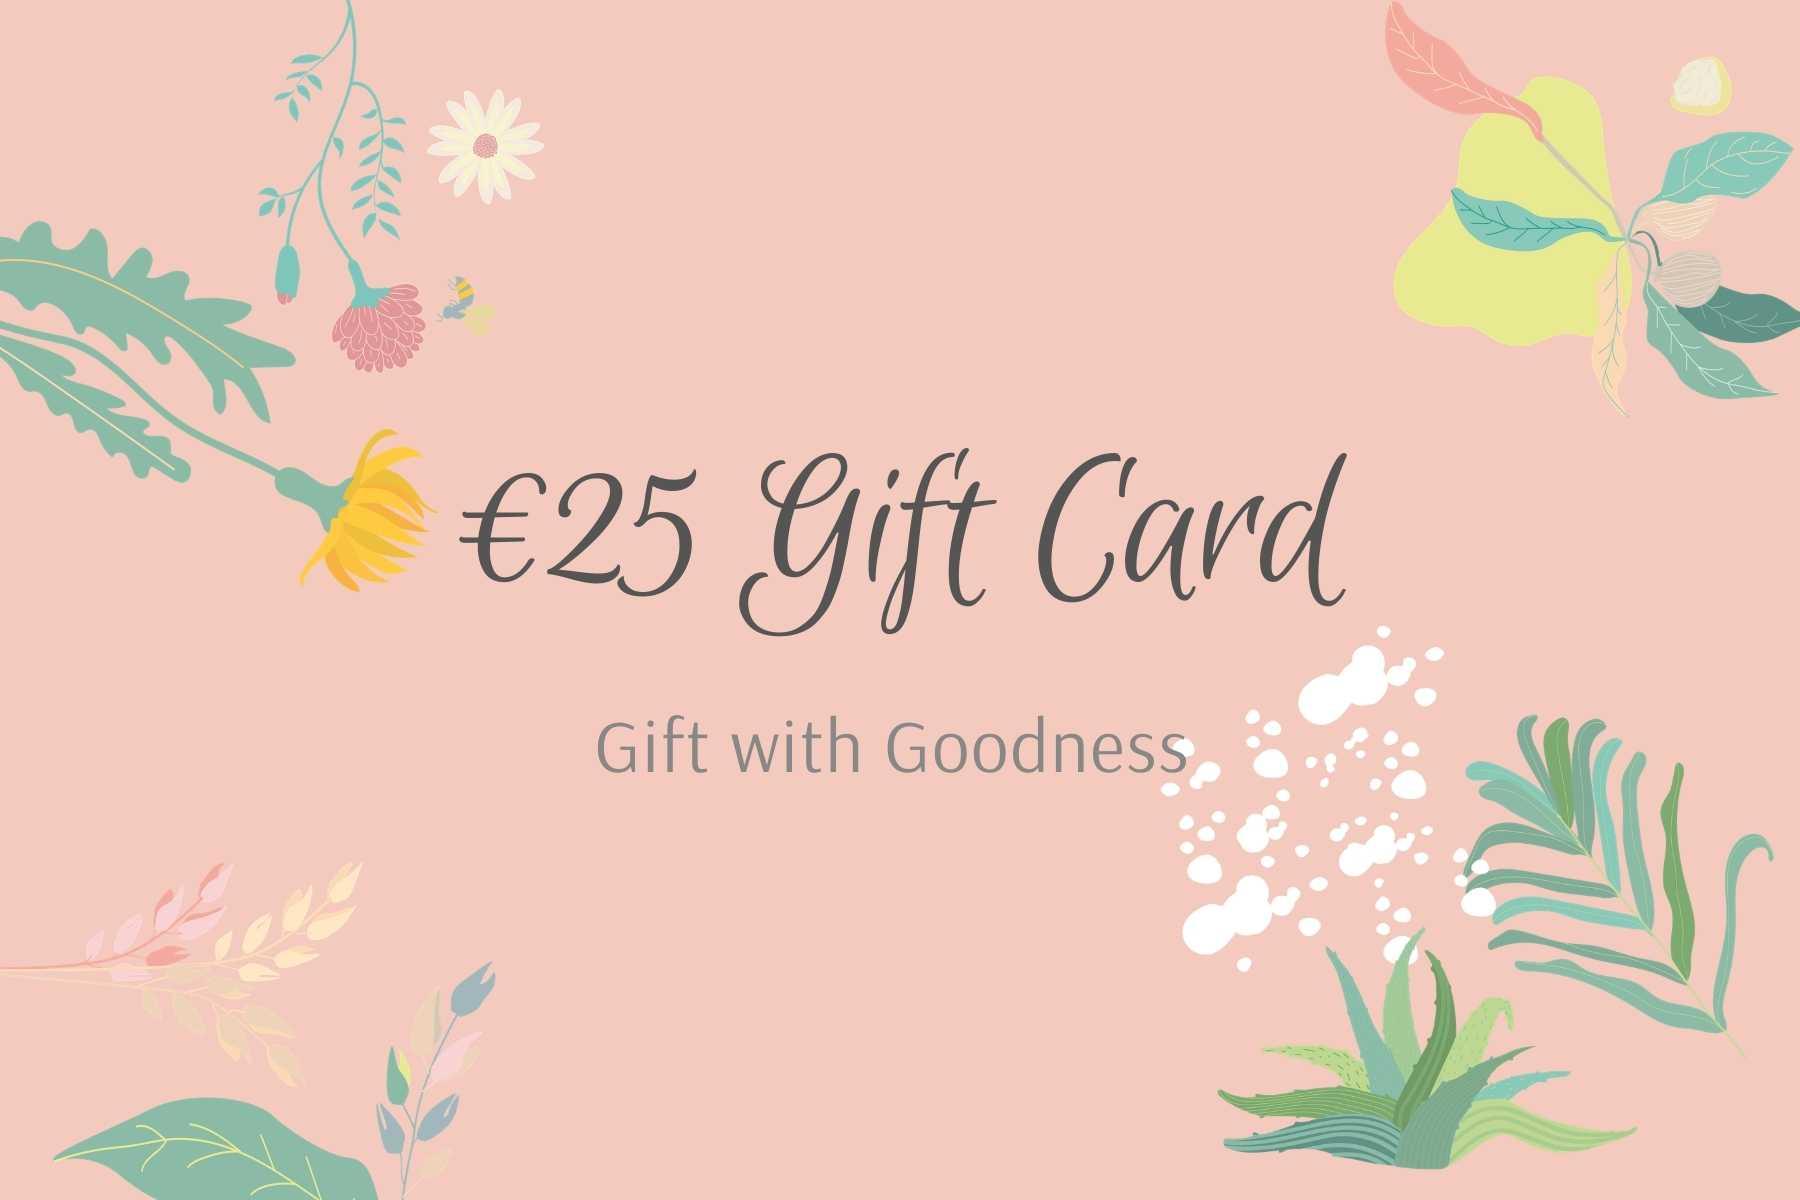 €25 Gift Card